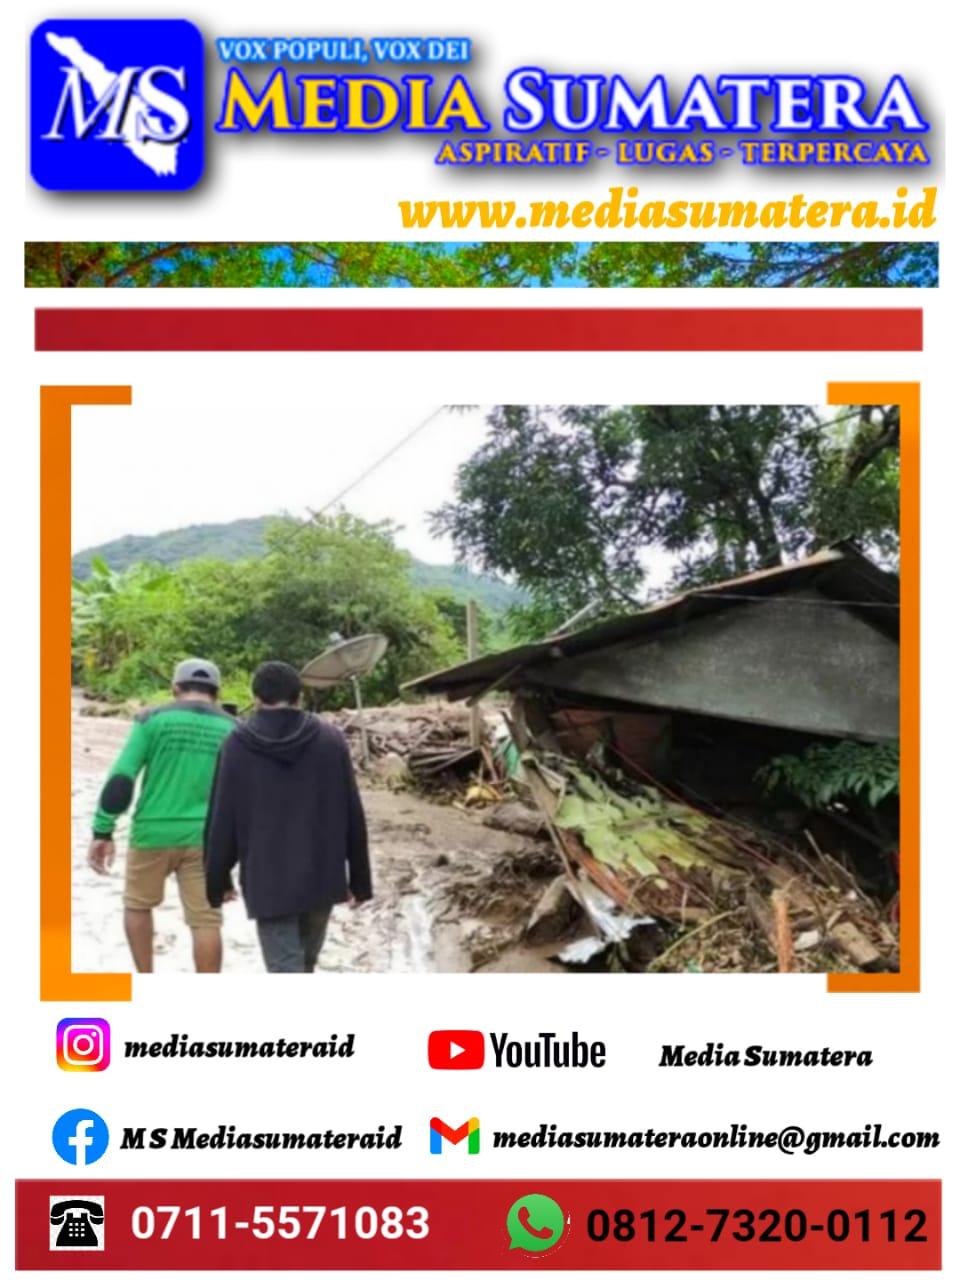 ASAYAMA FAMILY CLUB (AFC) Indonesia Beri Bantuan 50 Unit Rumah Bagi Warga Kupang Korban Bencana Longsor Dan Banjir Bandang